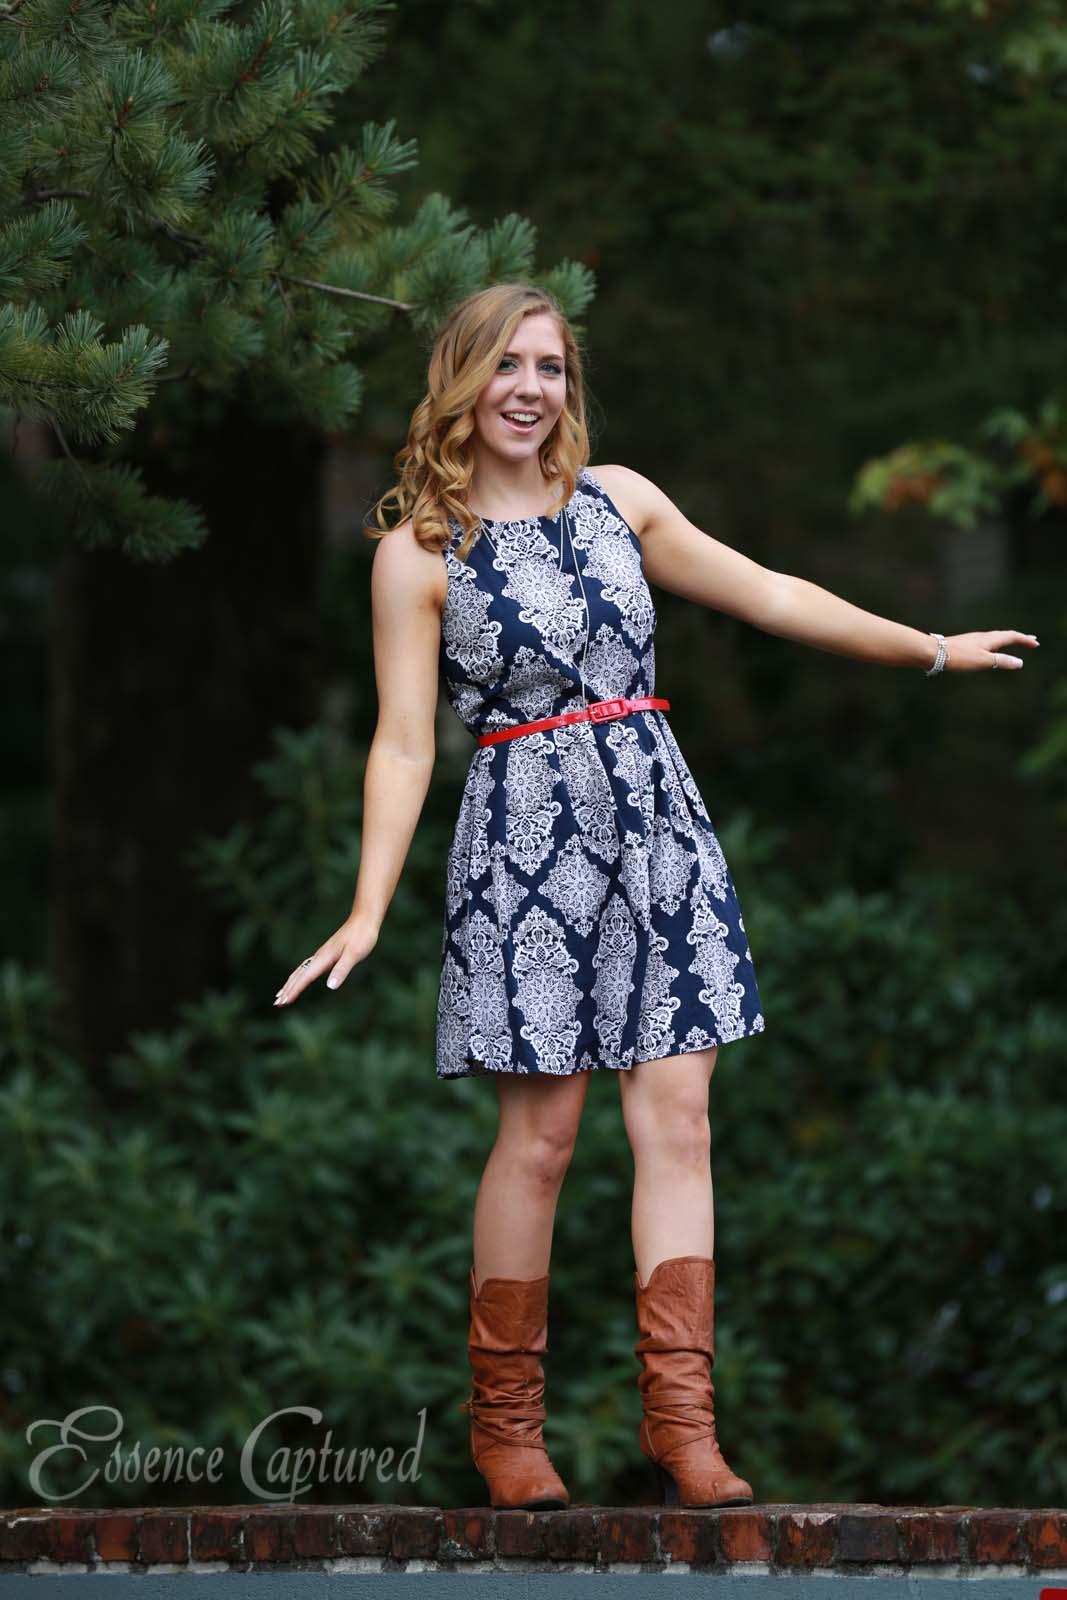 female high school senior portrait blue print dress long blonde hair walking on wall dark green natural background